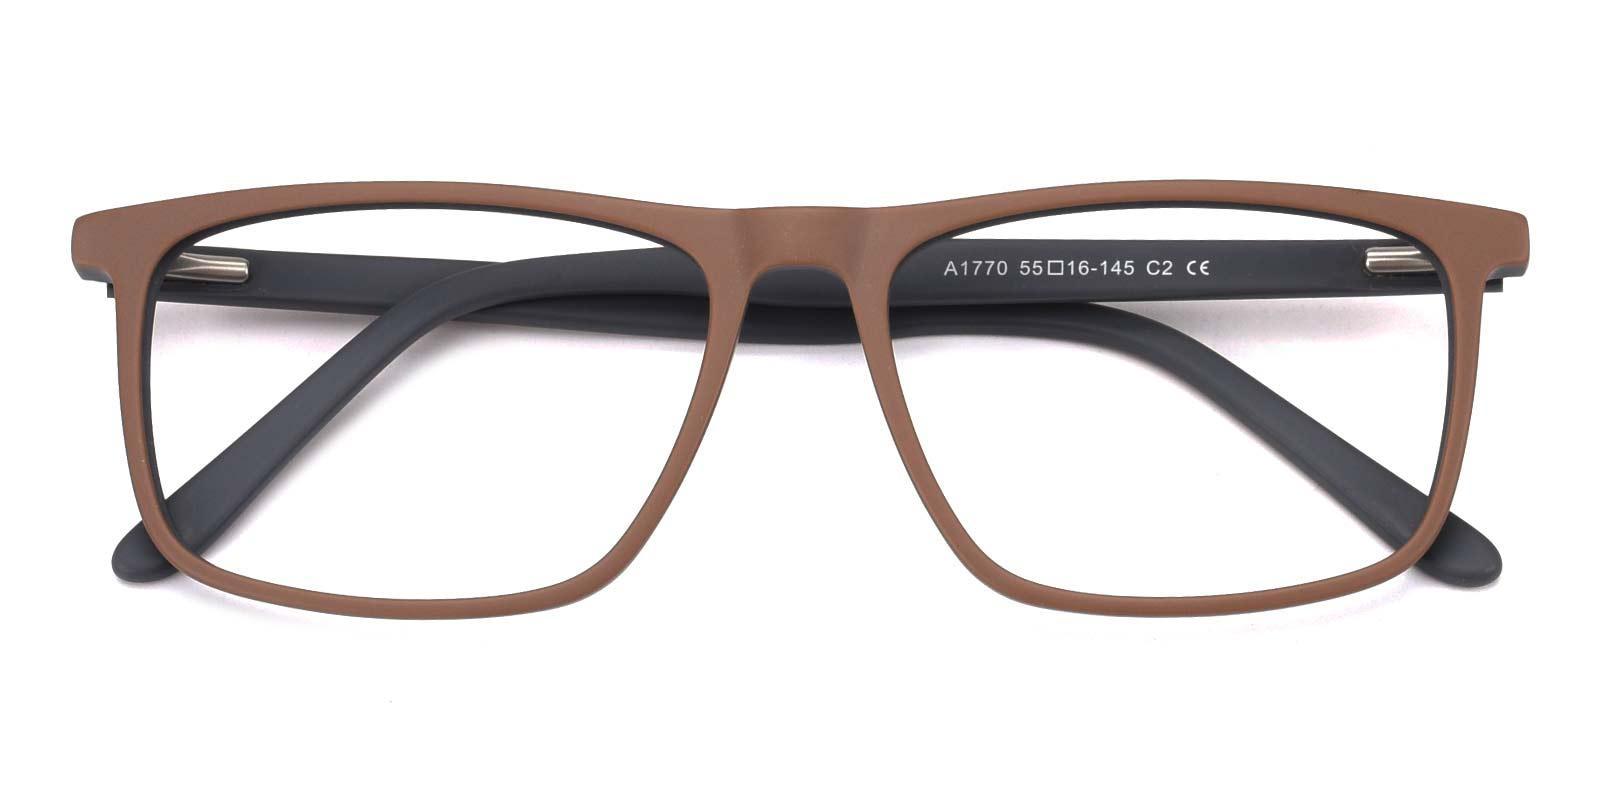 Barbar-Brown-Rectangle-Acetate-Eyeglasses-detail